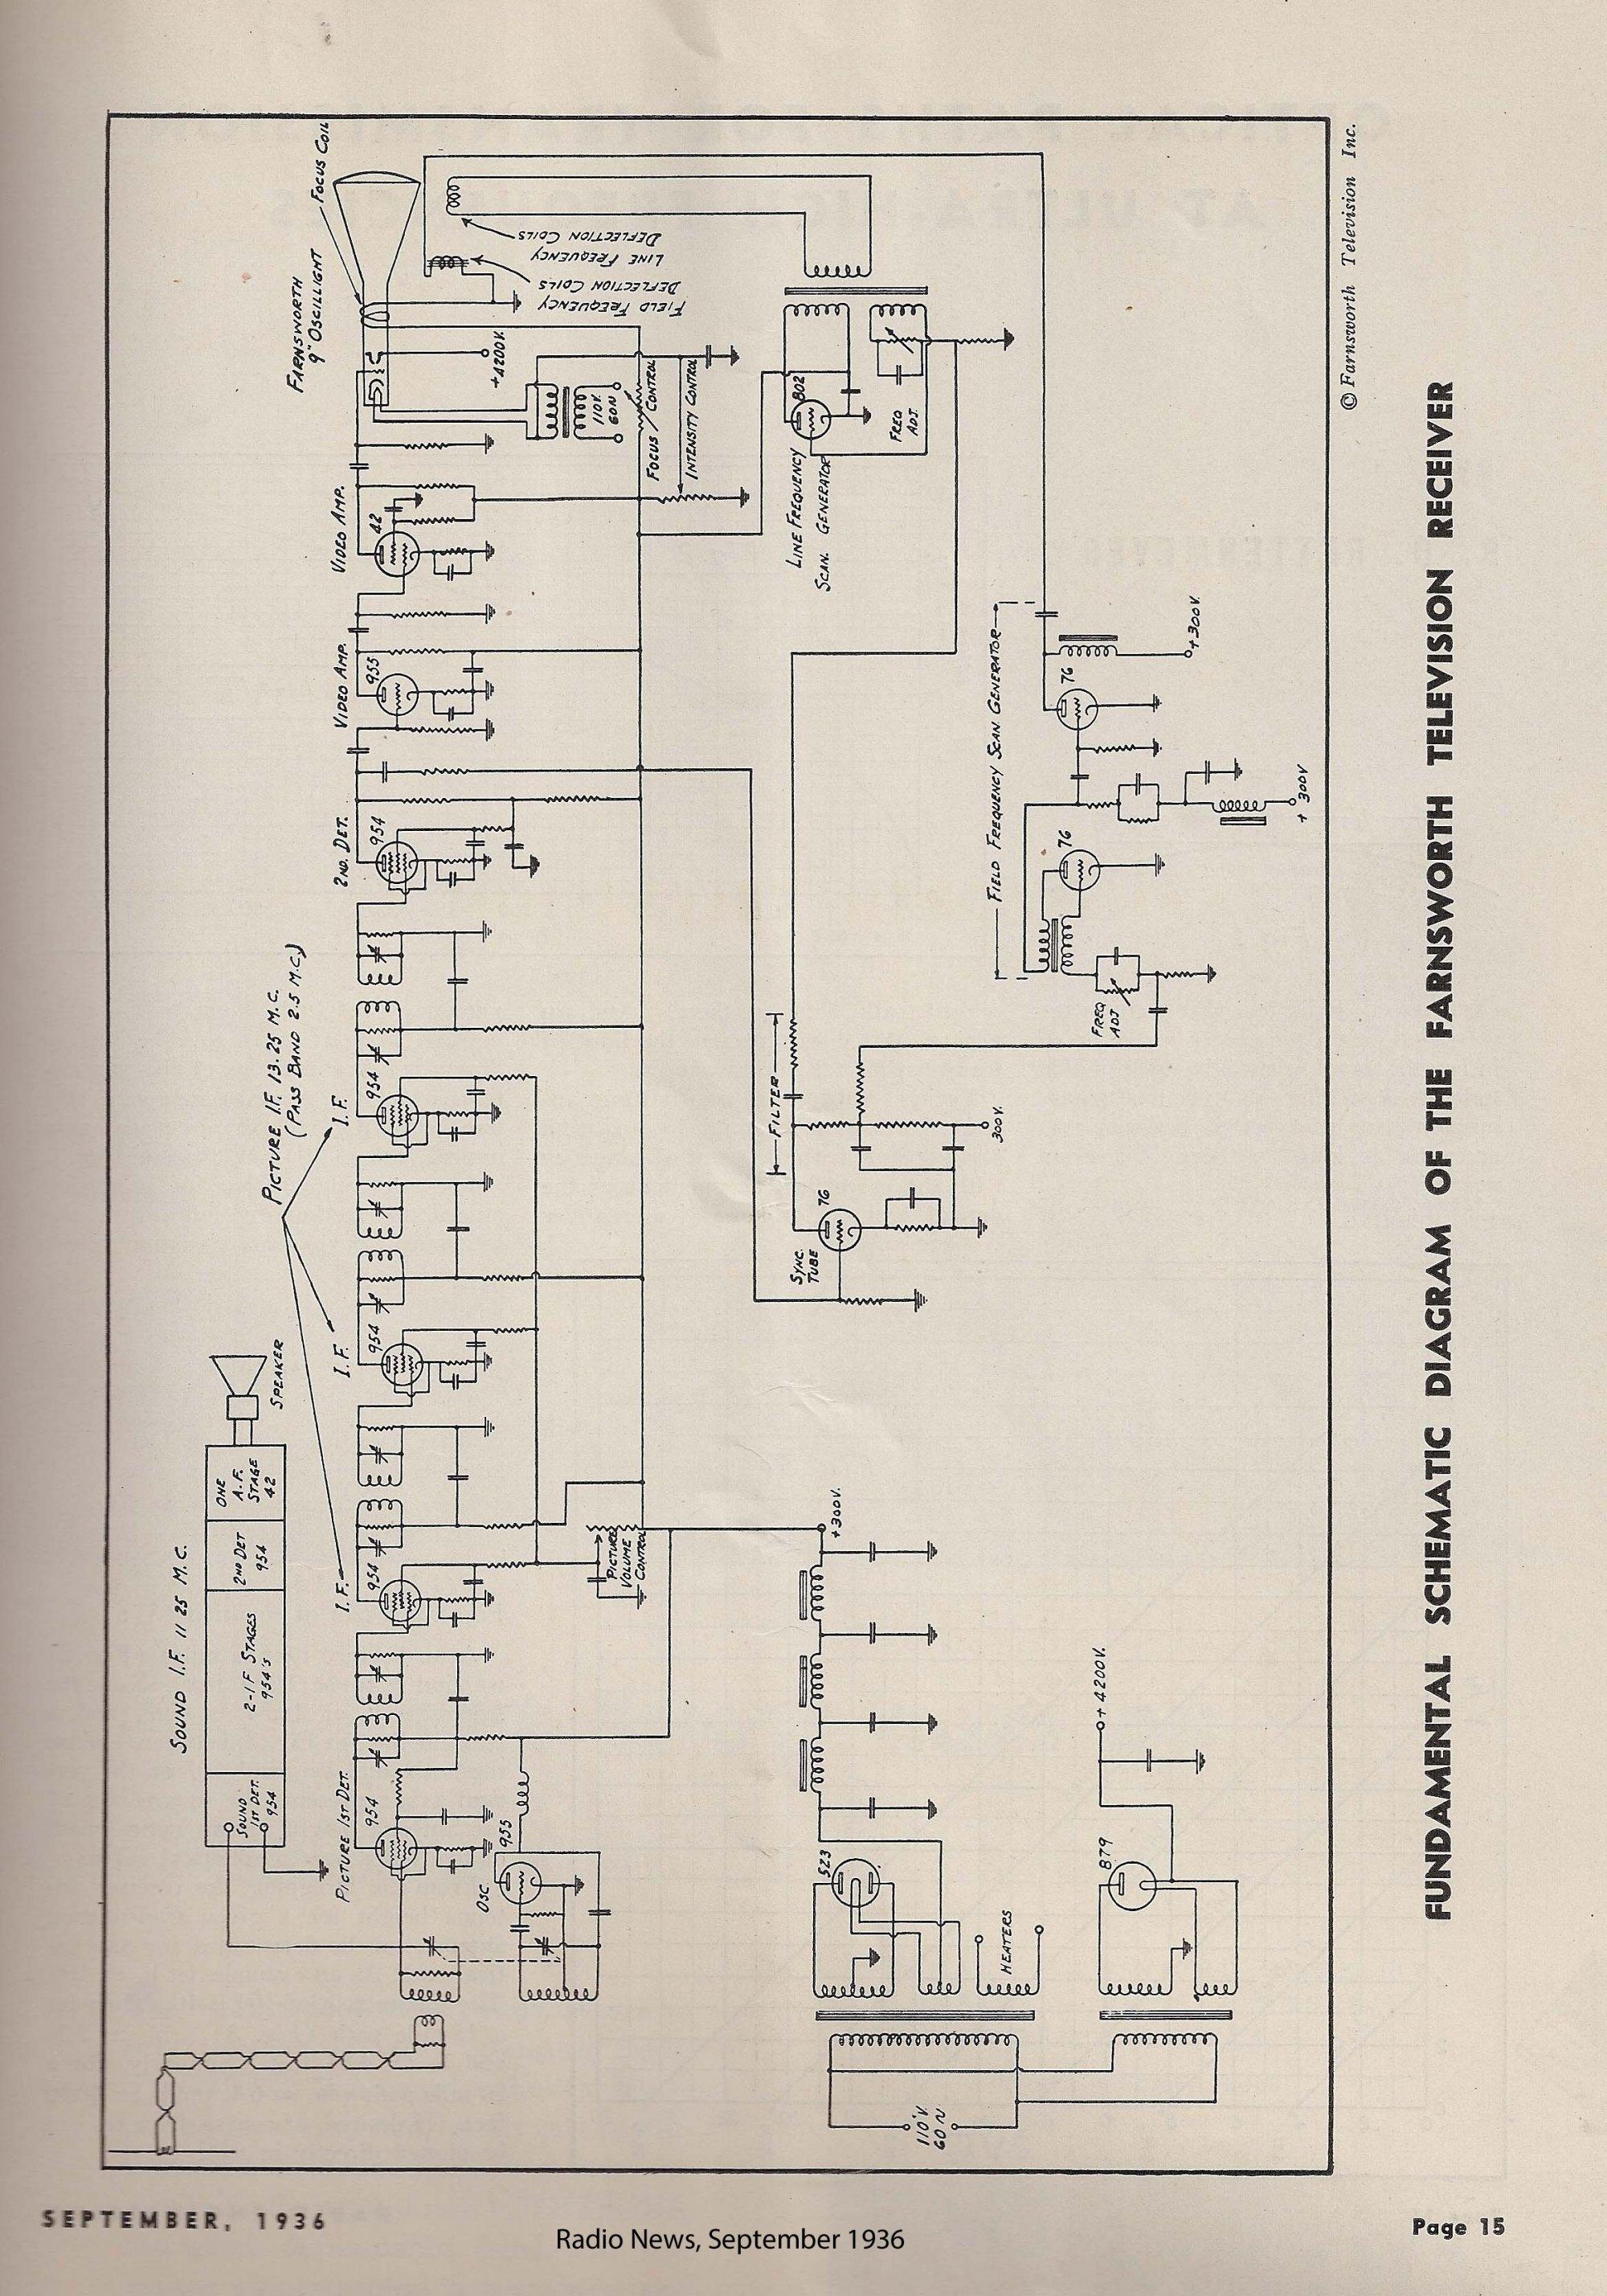 hight resolution of 1936 receiver schematic 35